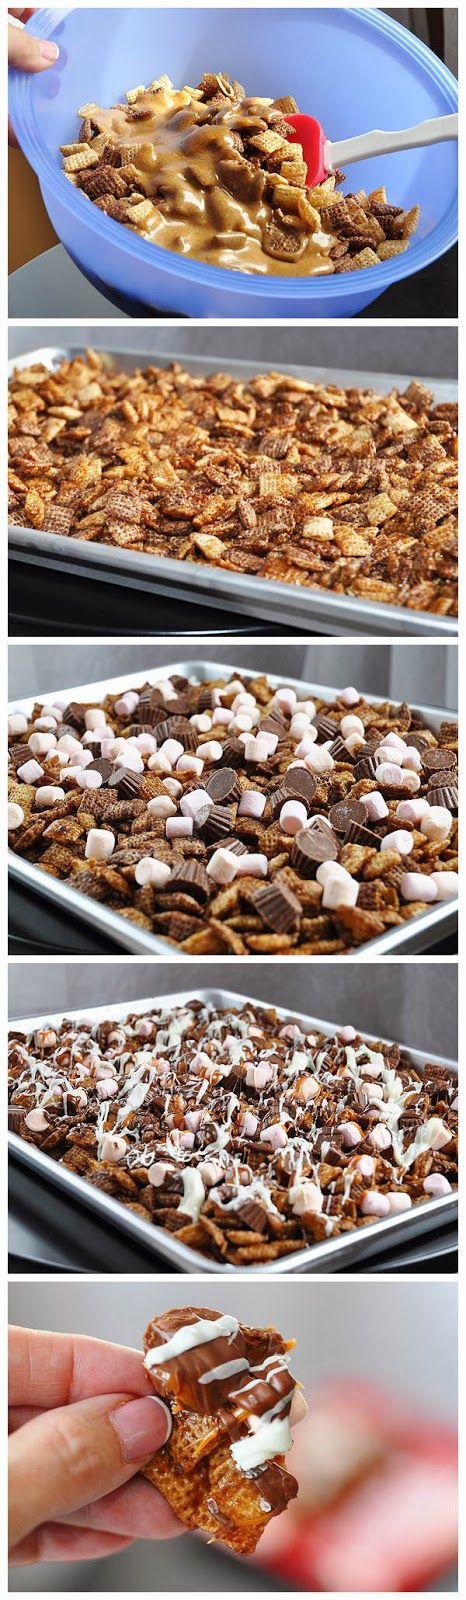 Chocolate, caramel, peanut butter, marshmallow, Chex, blammo